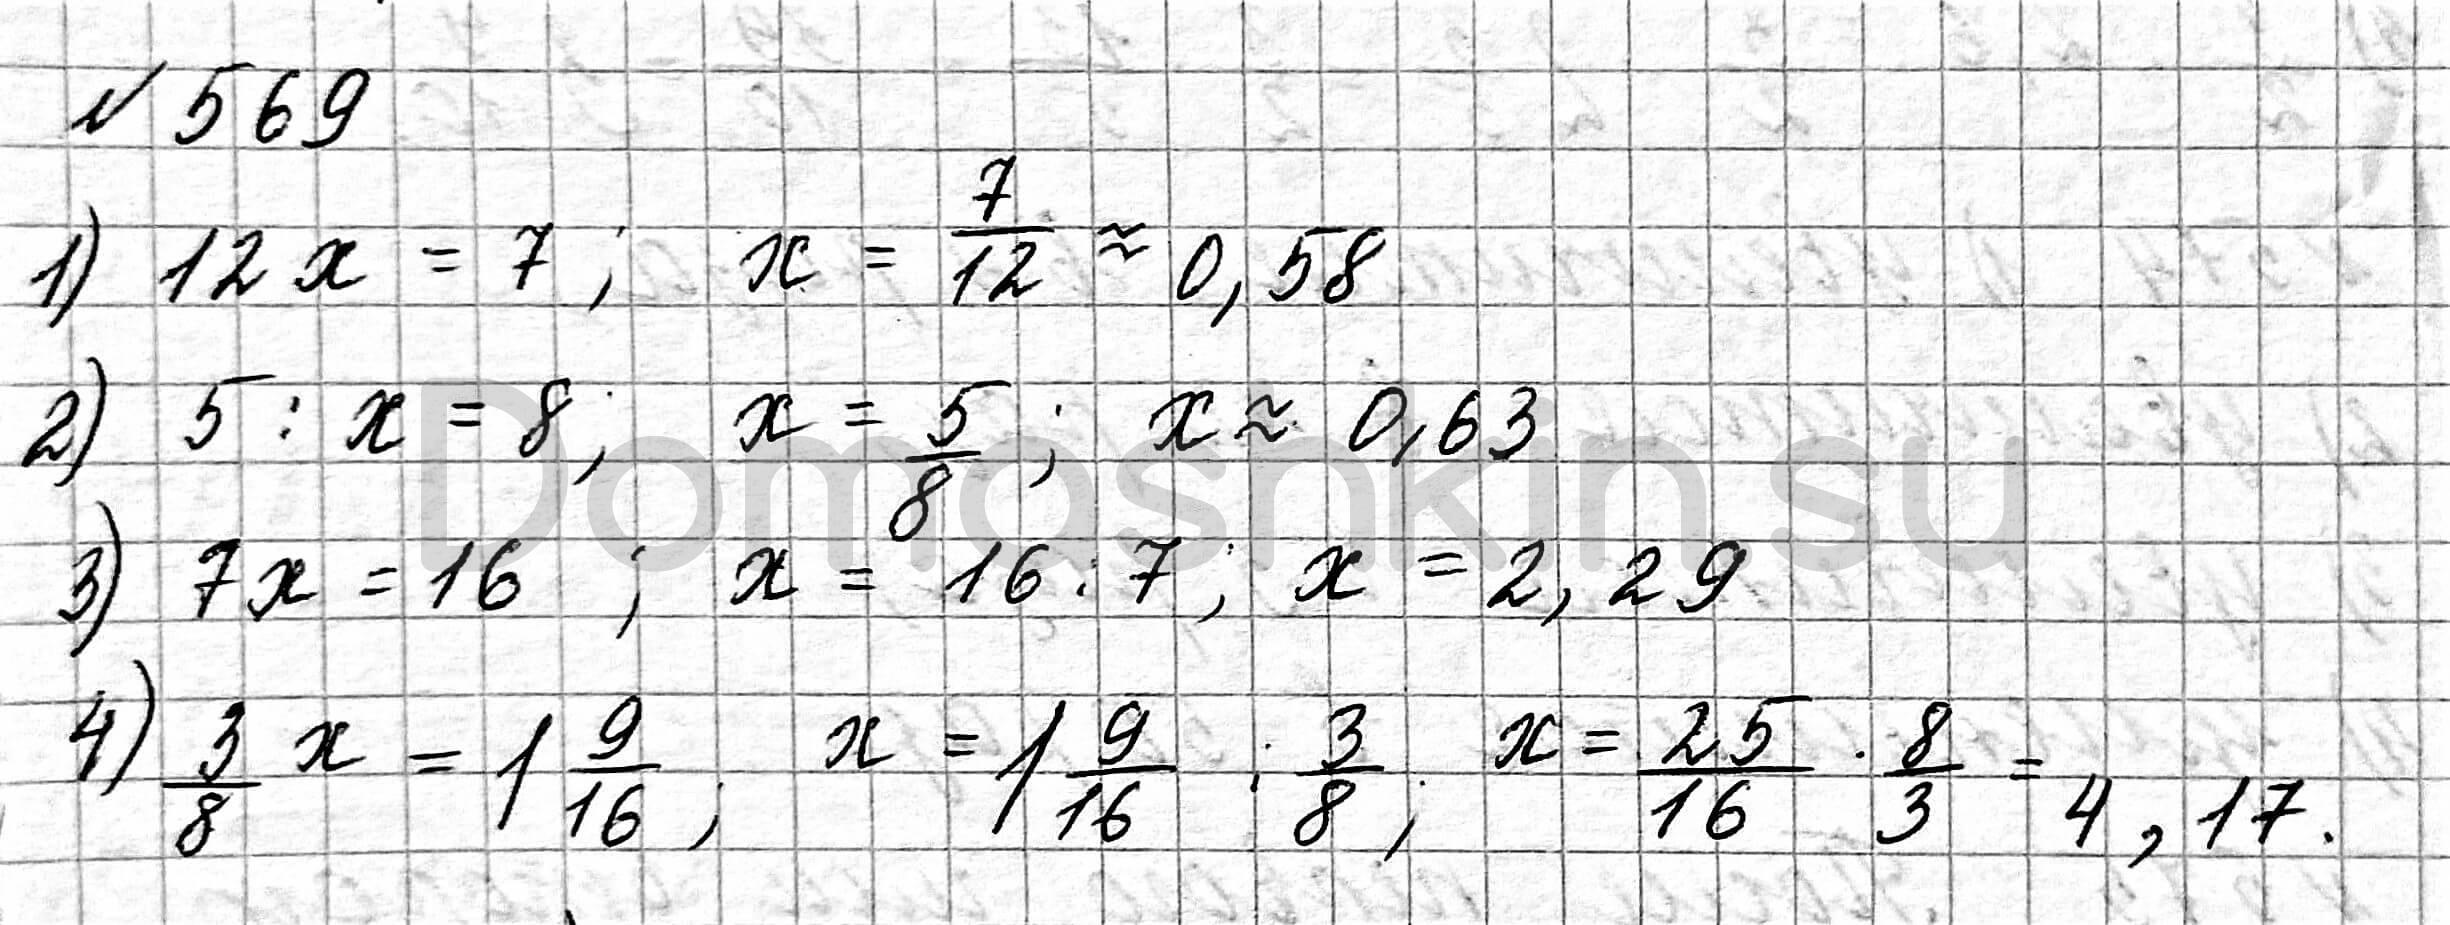 Математика 6 класс учебник Мерзляк номер 569 решение